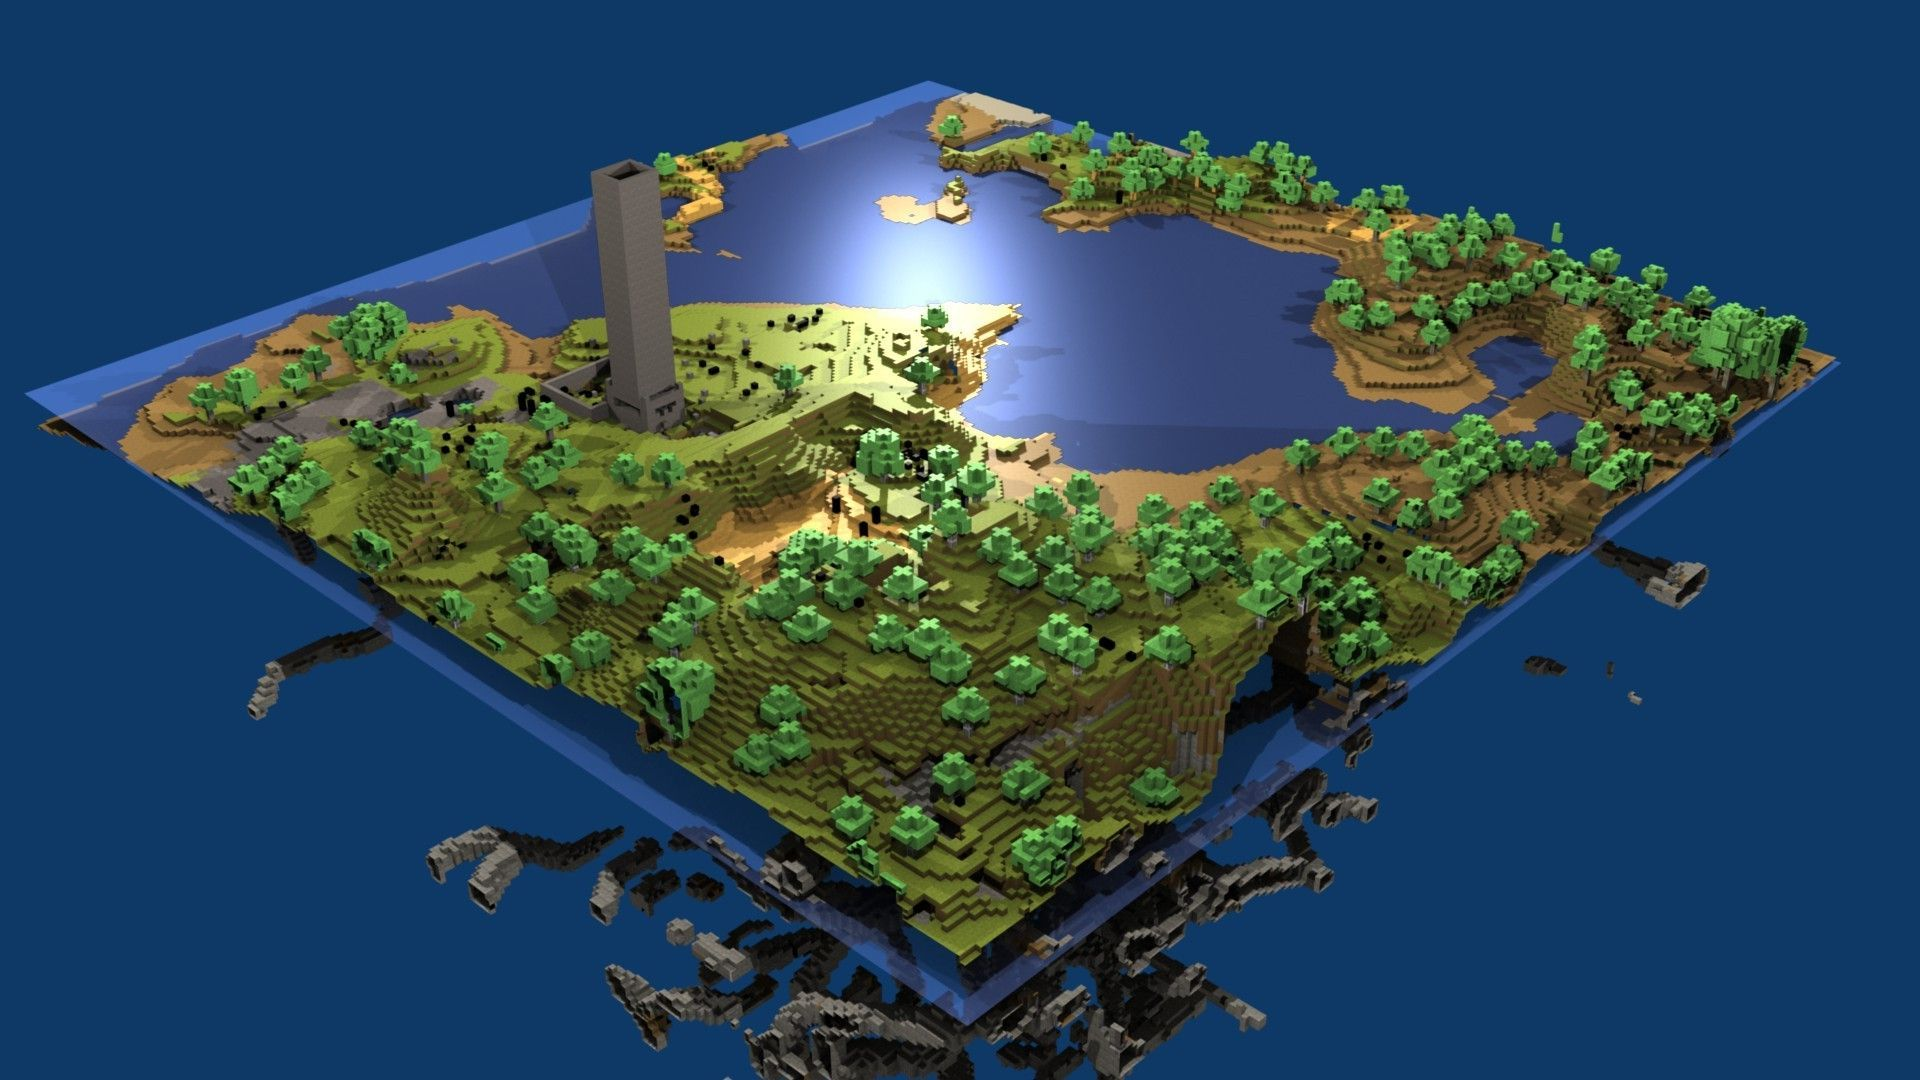 Creeper Wallpaper Hd Minecraft Wallpapers Hd Download Free Pixelstalk Net